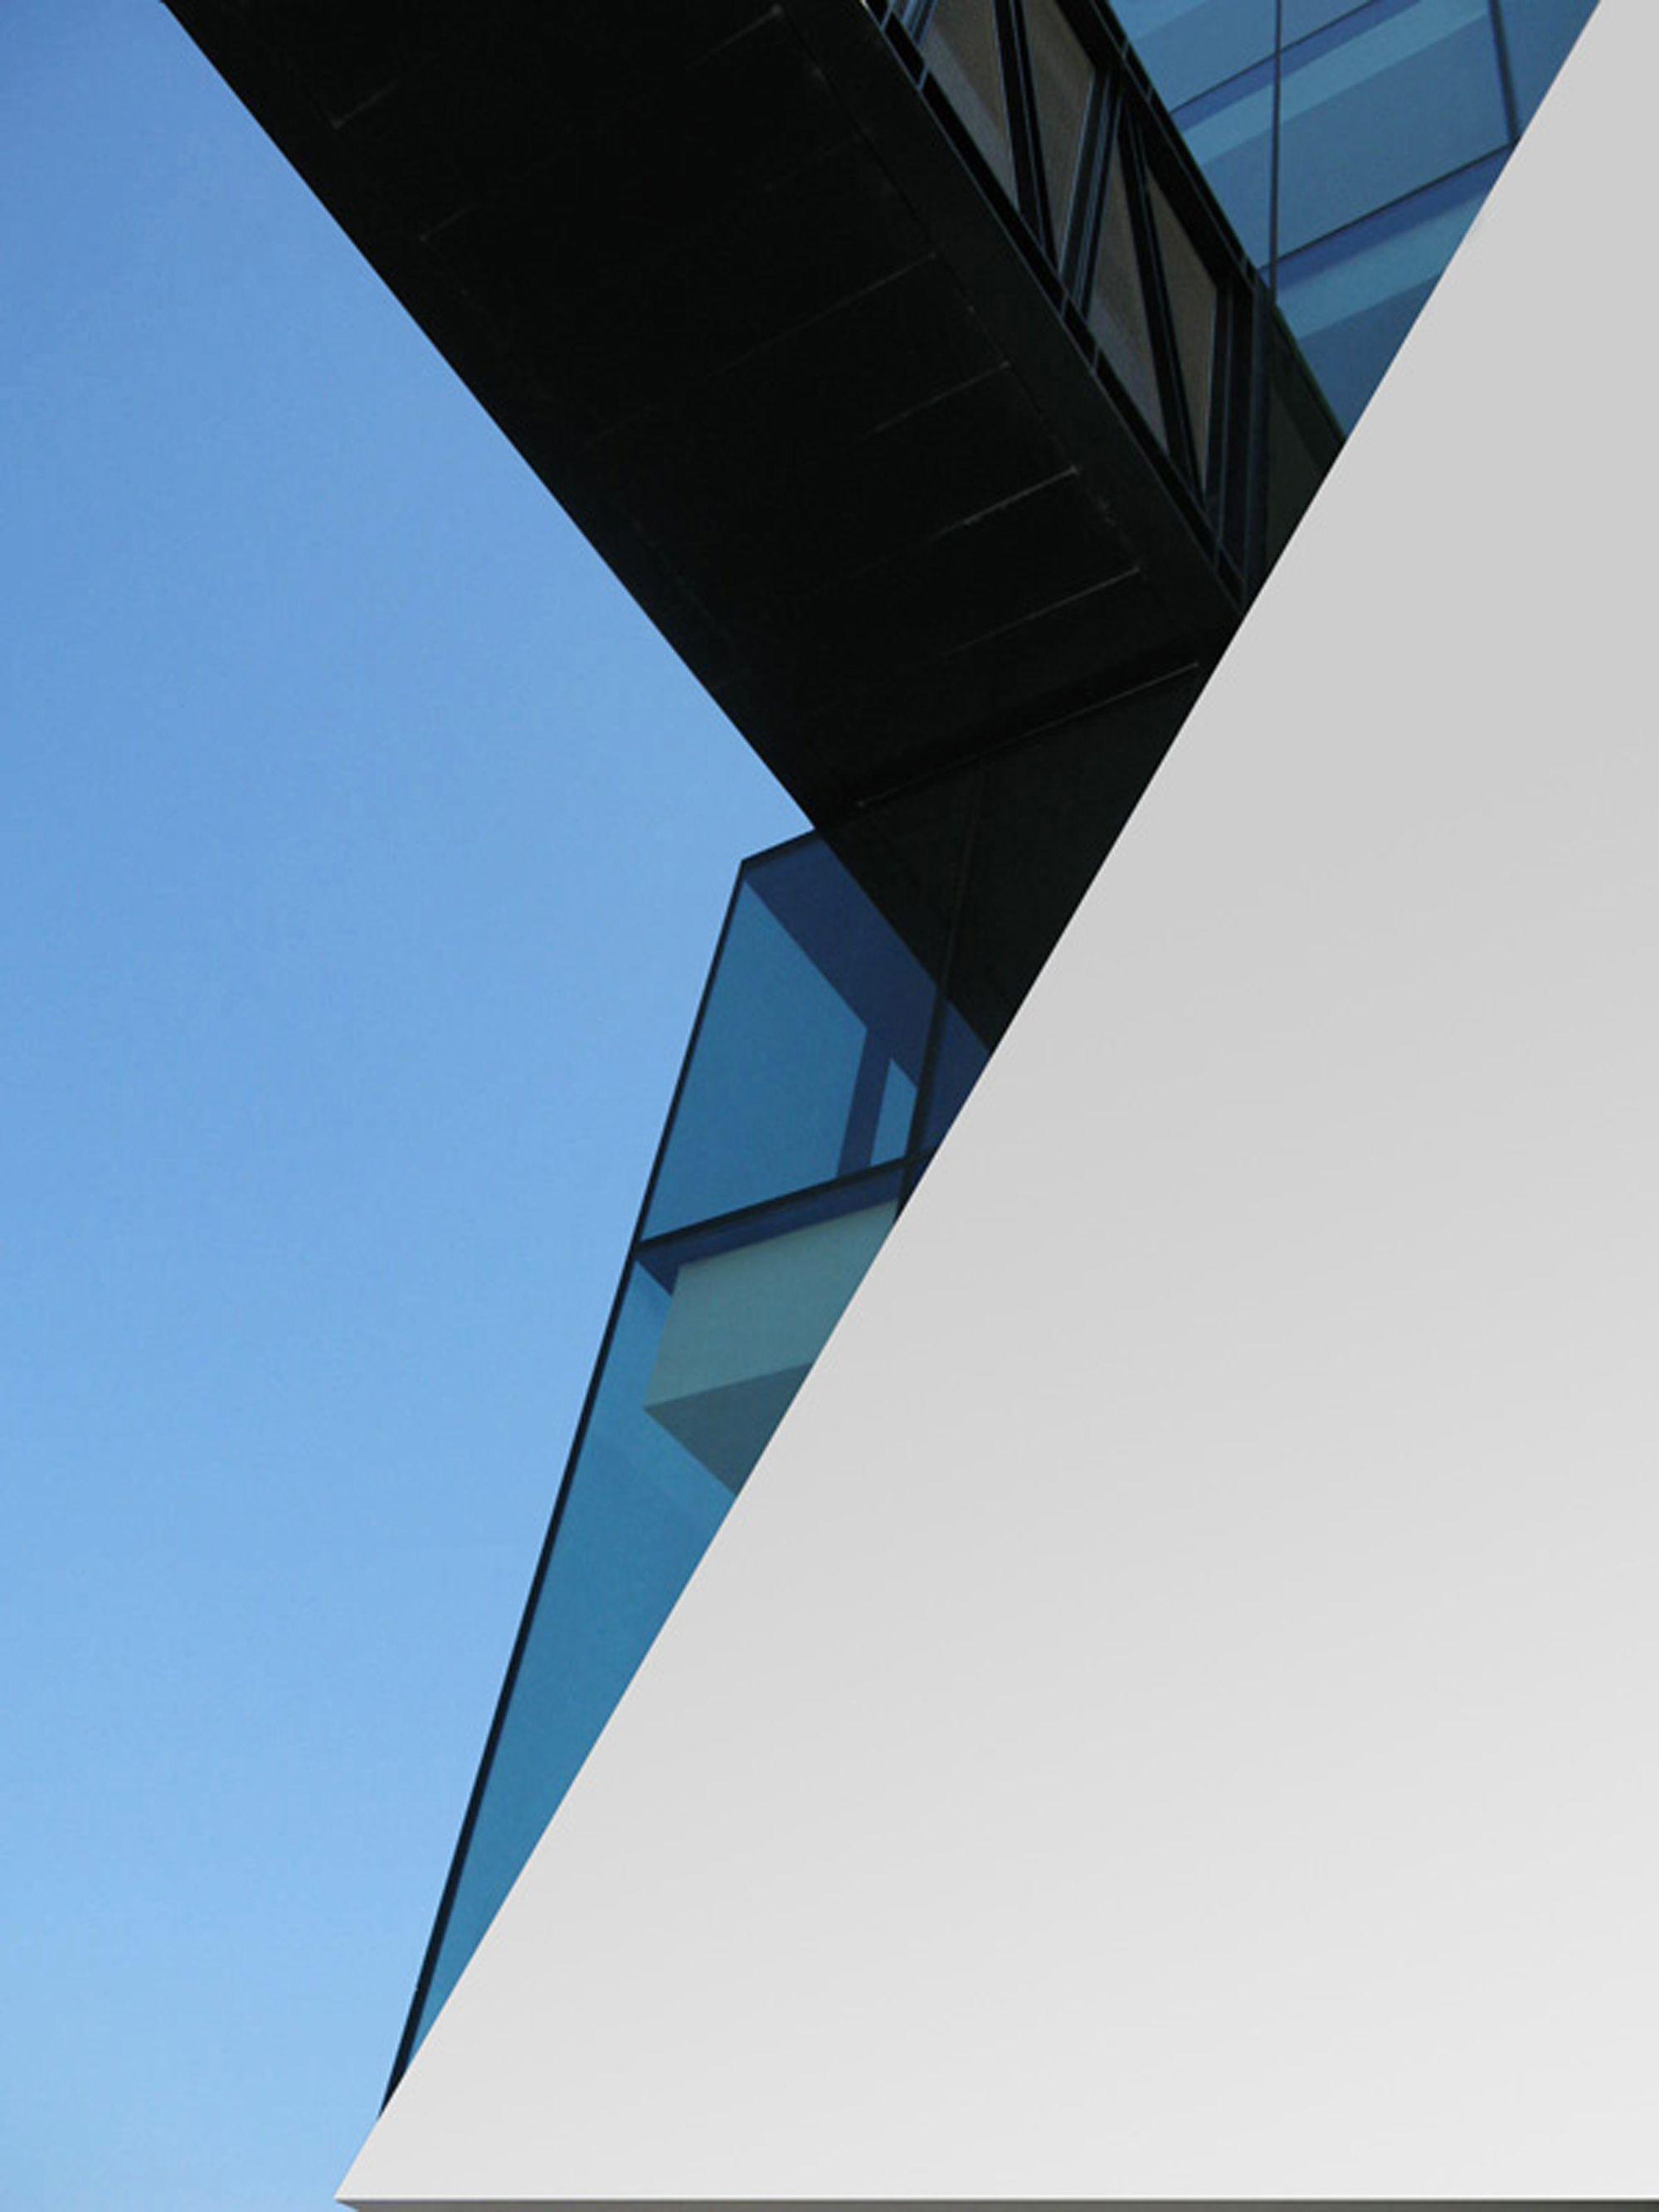 Galeria - Biblioteca Municipal Vila Franca de Xira / Miguel Arruda Arquitectos Associados - 7